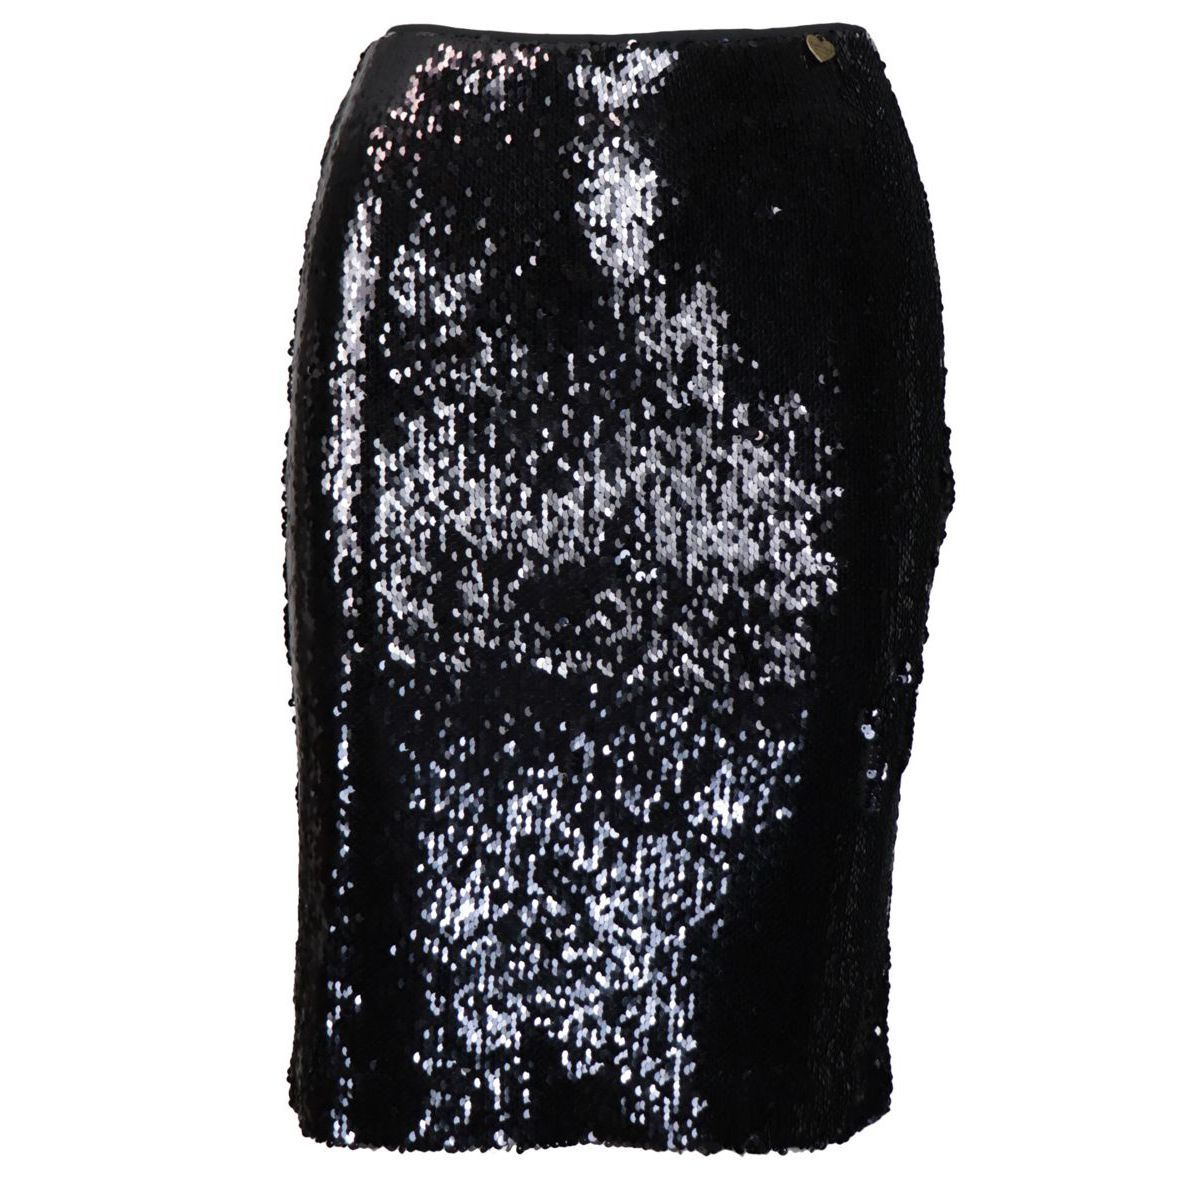 Full sequined viscose pencil skirt Black Twin-Set